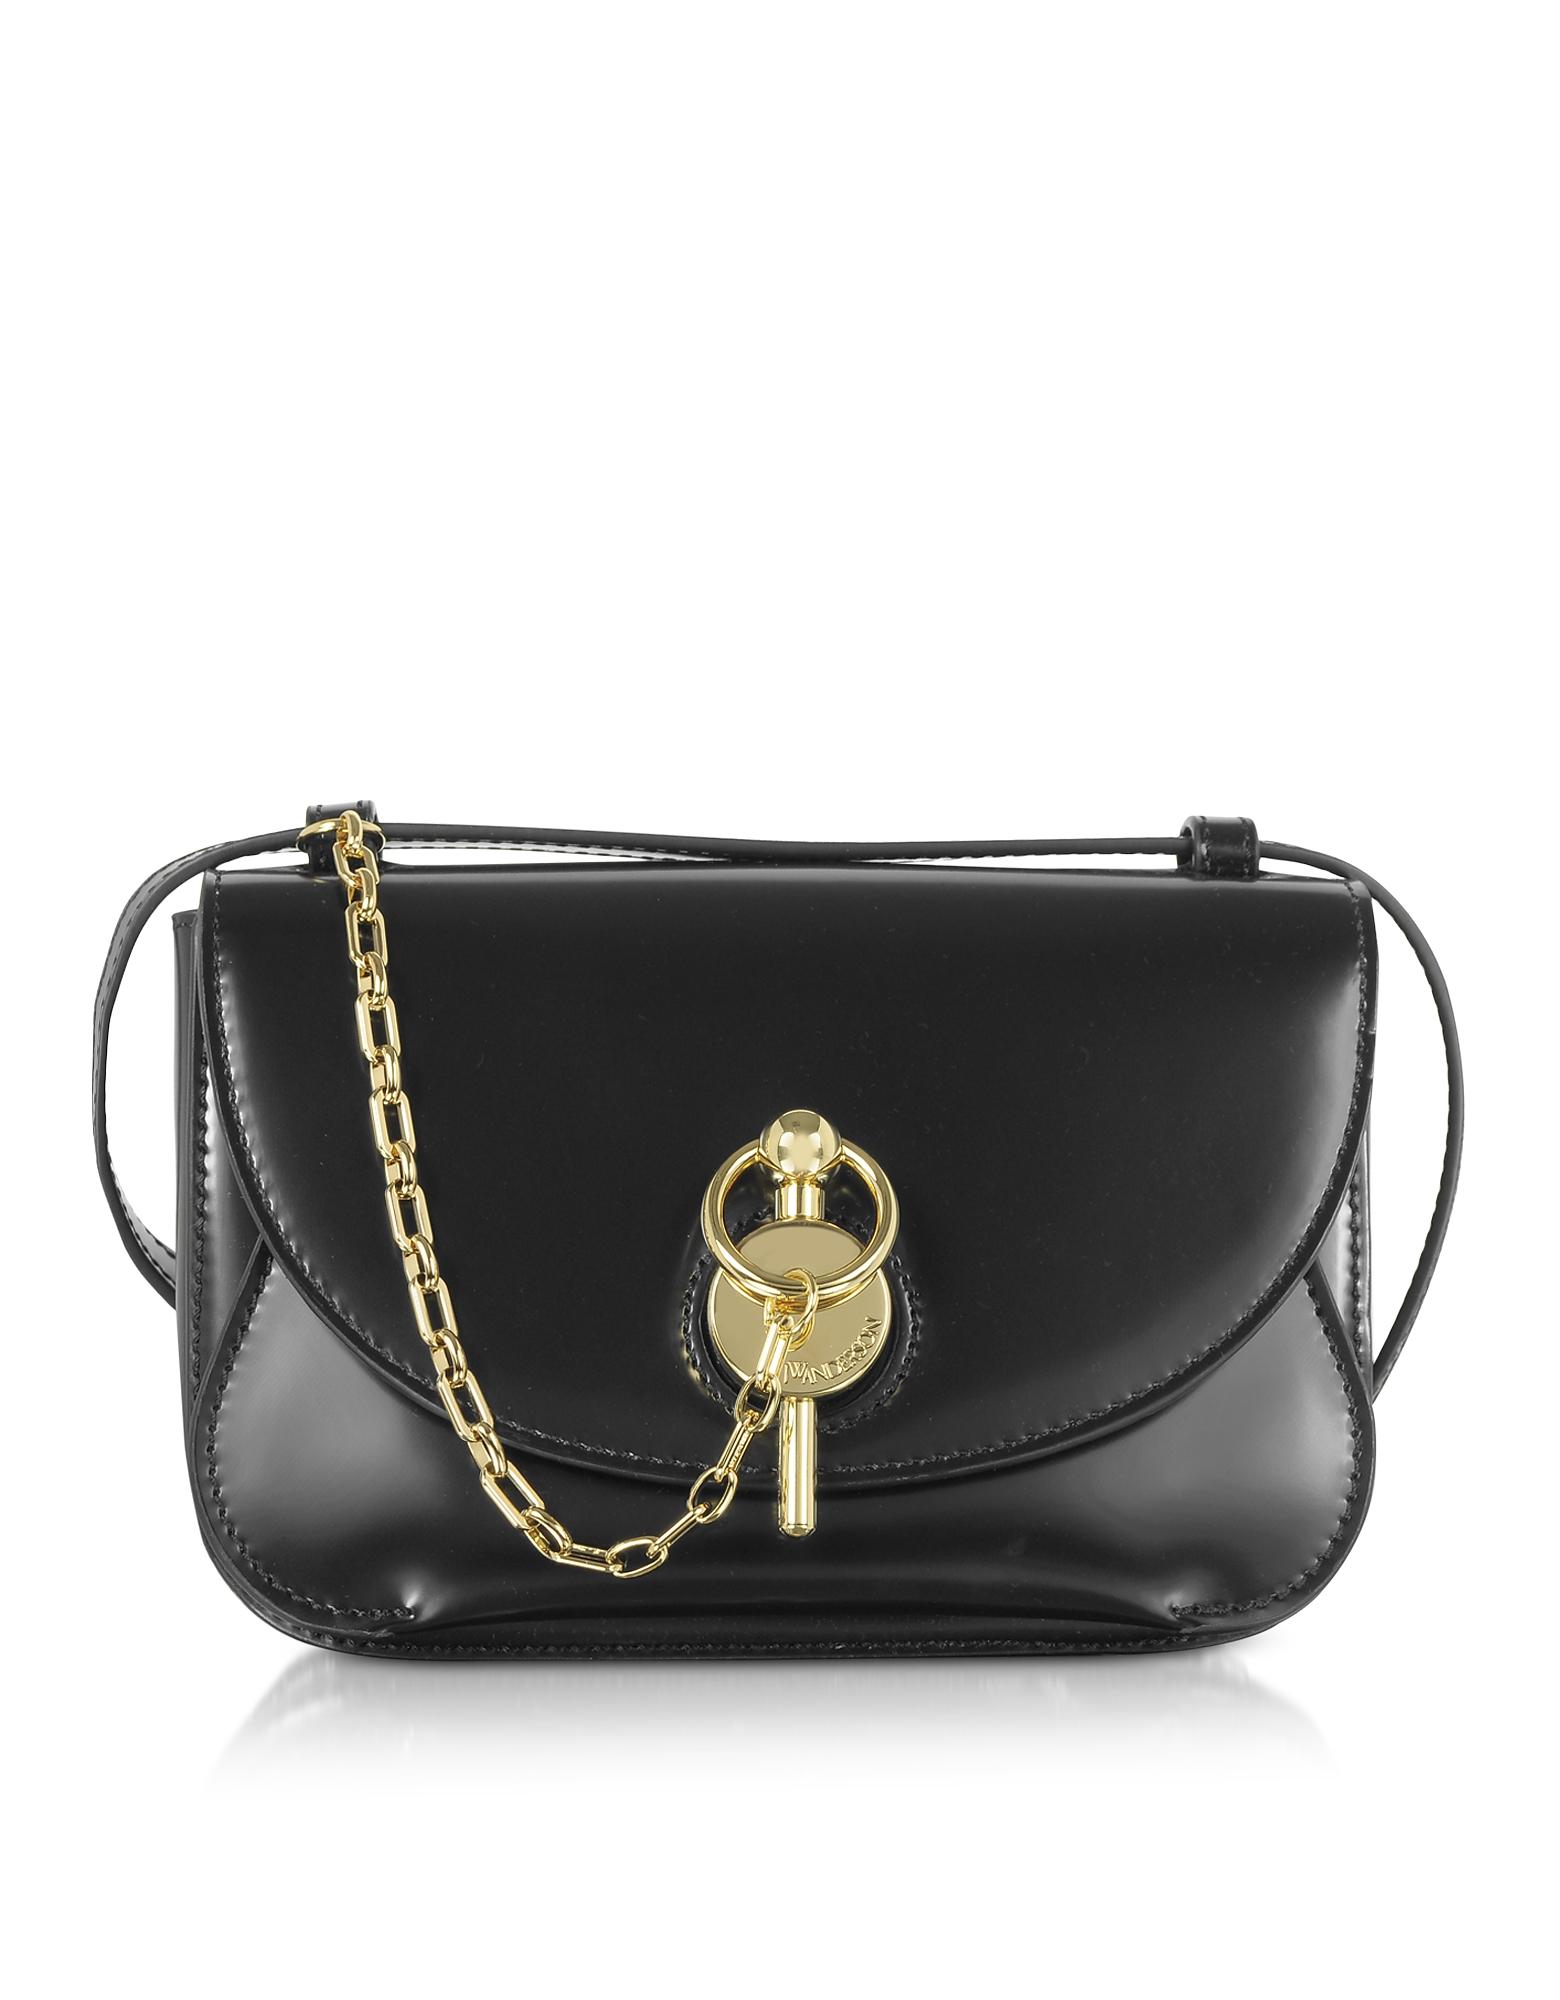 JW Anderson Designer Handbags, Black Midi Keyts Crossbody Bag